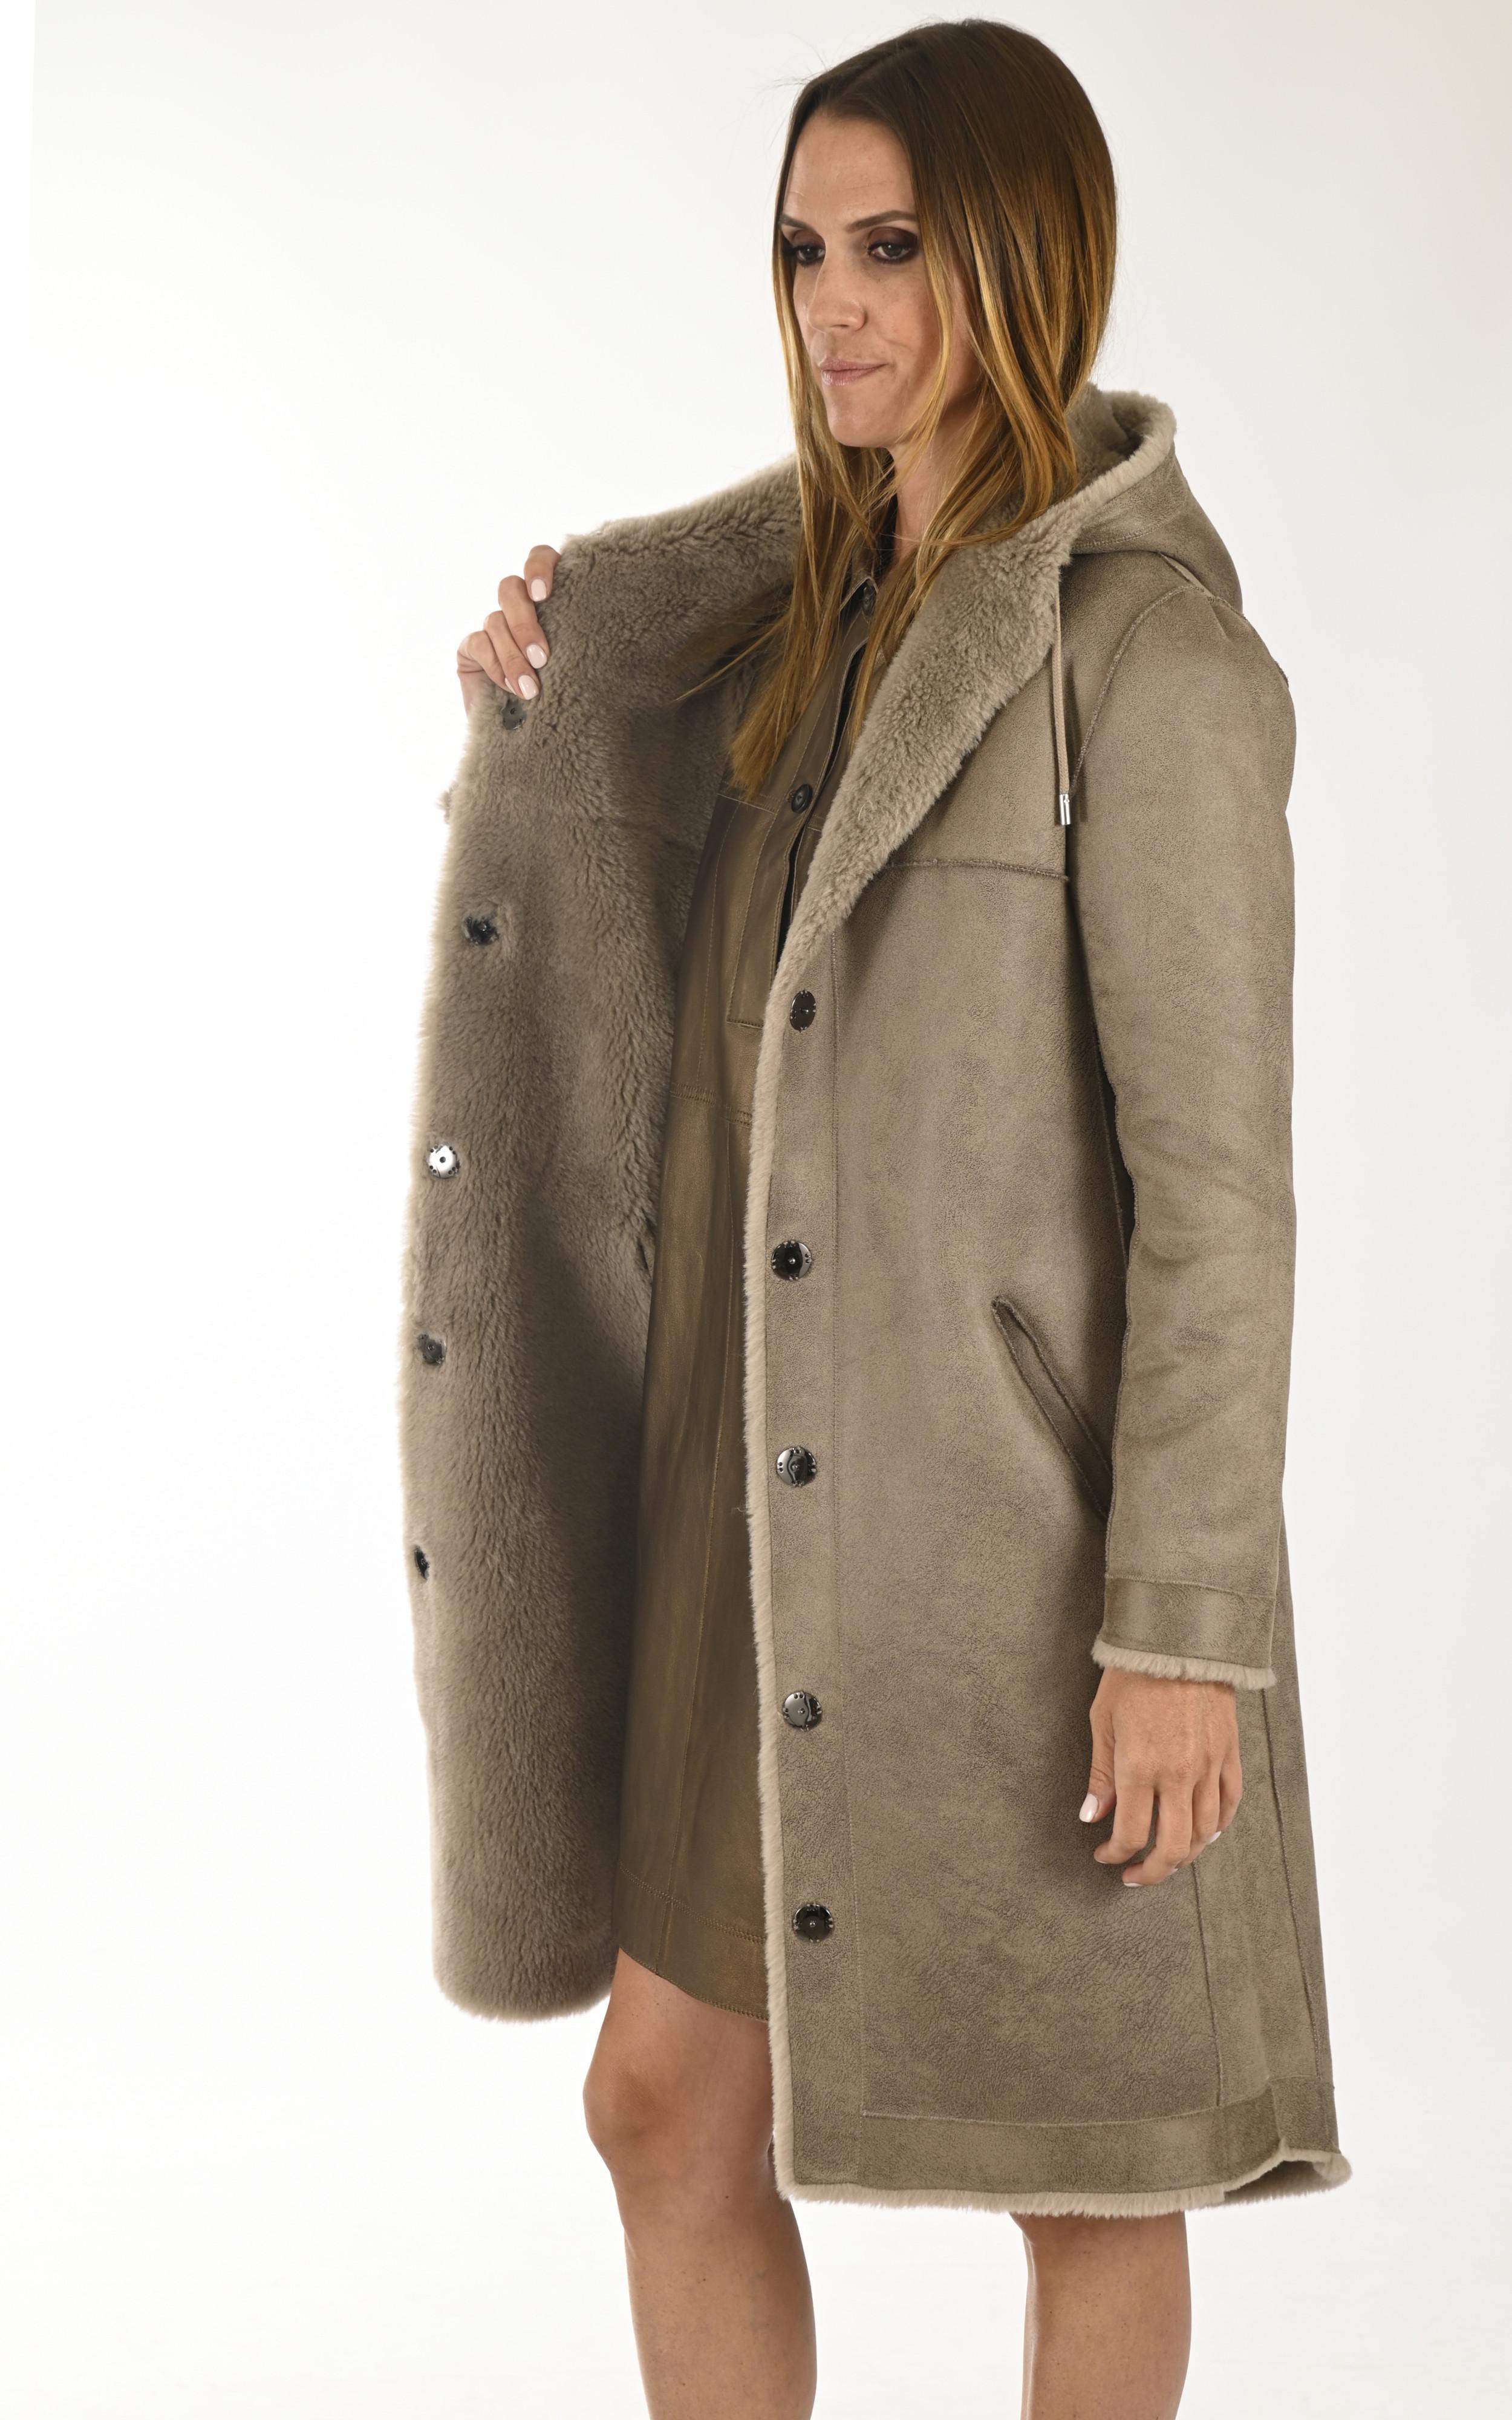 Manteau réversible Muse taupe Oakwood